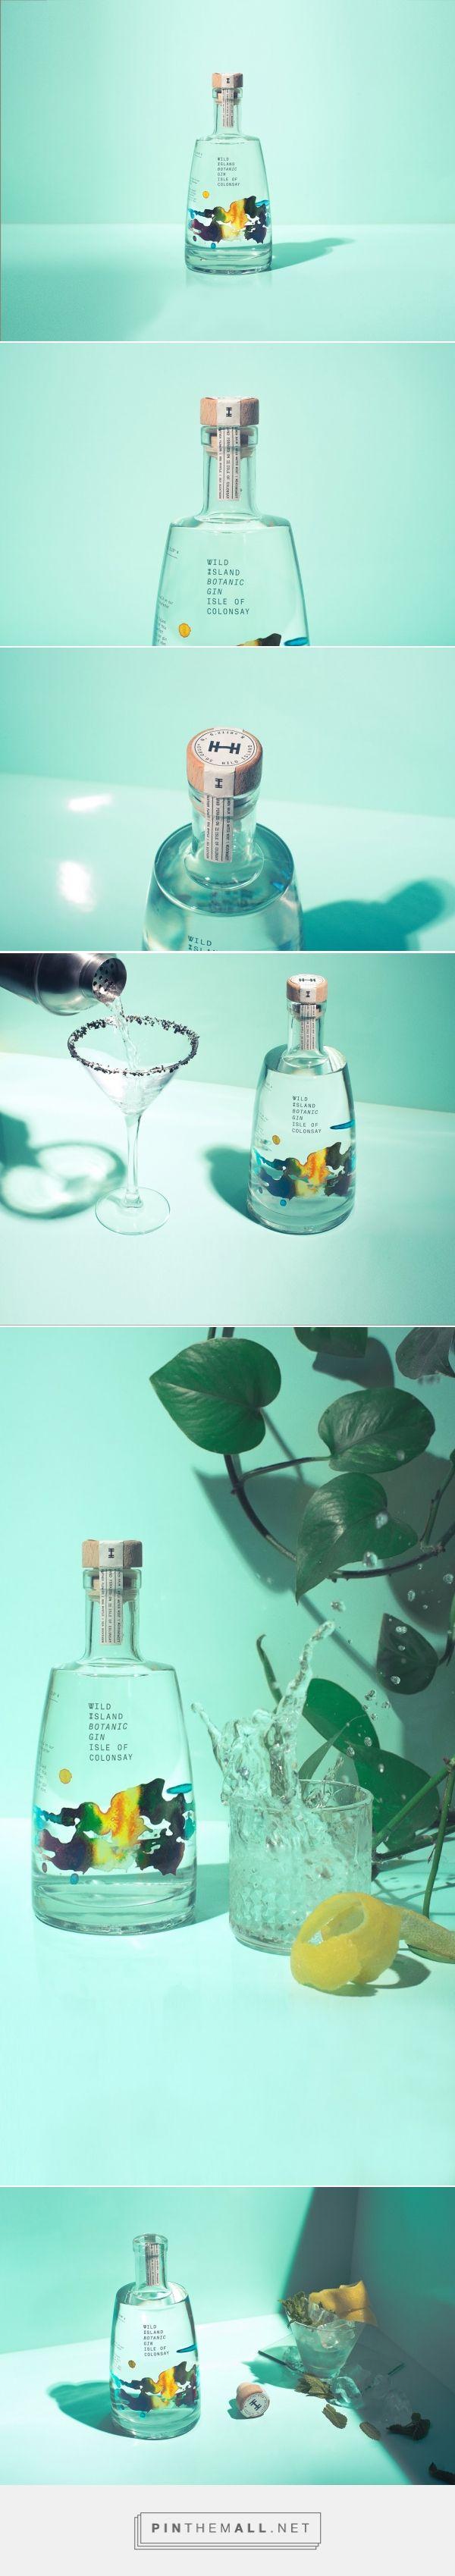 Wild Island - Botanical #Gin packaging design by Thirst - http://www.packagingoftheworld.com/2017/05/wild-island-botanical-gin.html